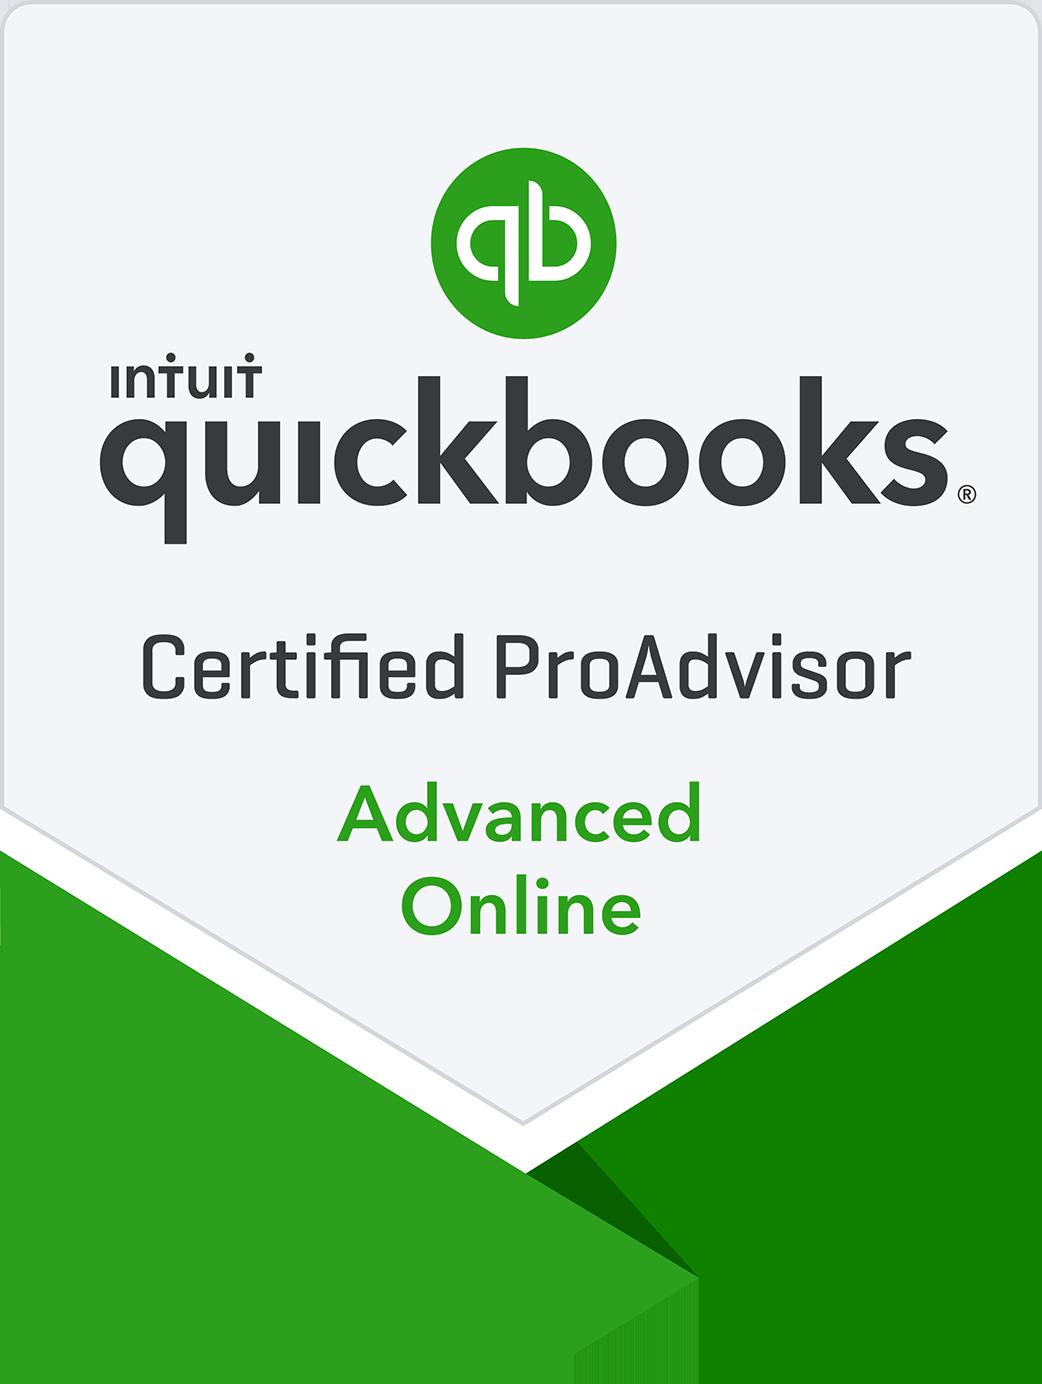 QuickBooks Advanced Online Certified ProAdvisor - QuickBooks Online Certification